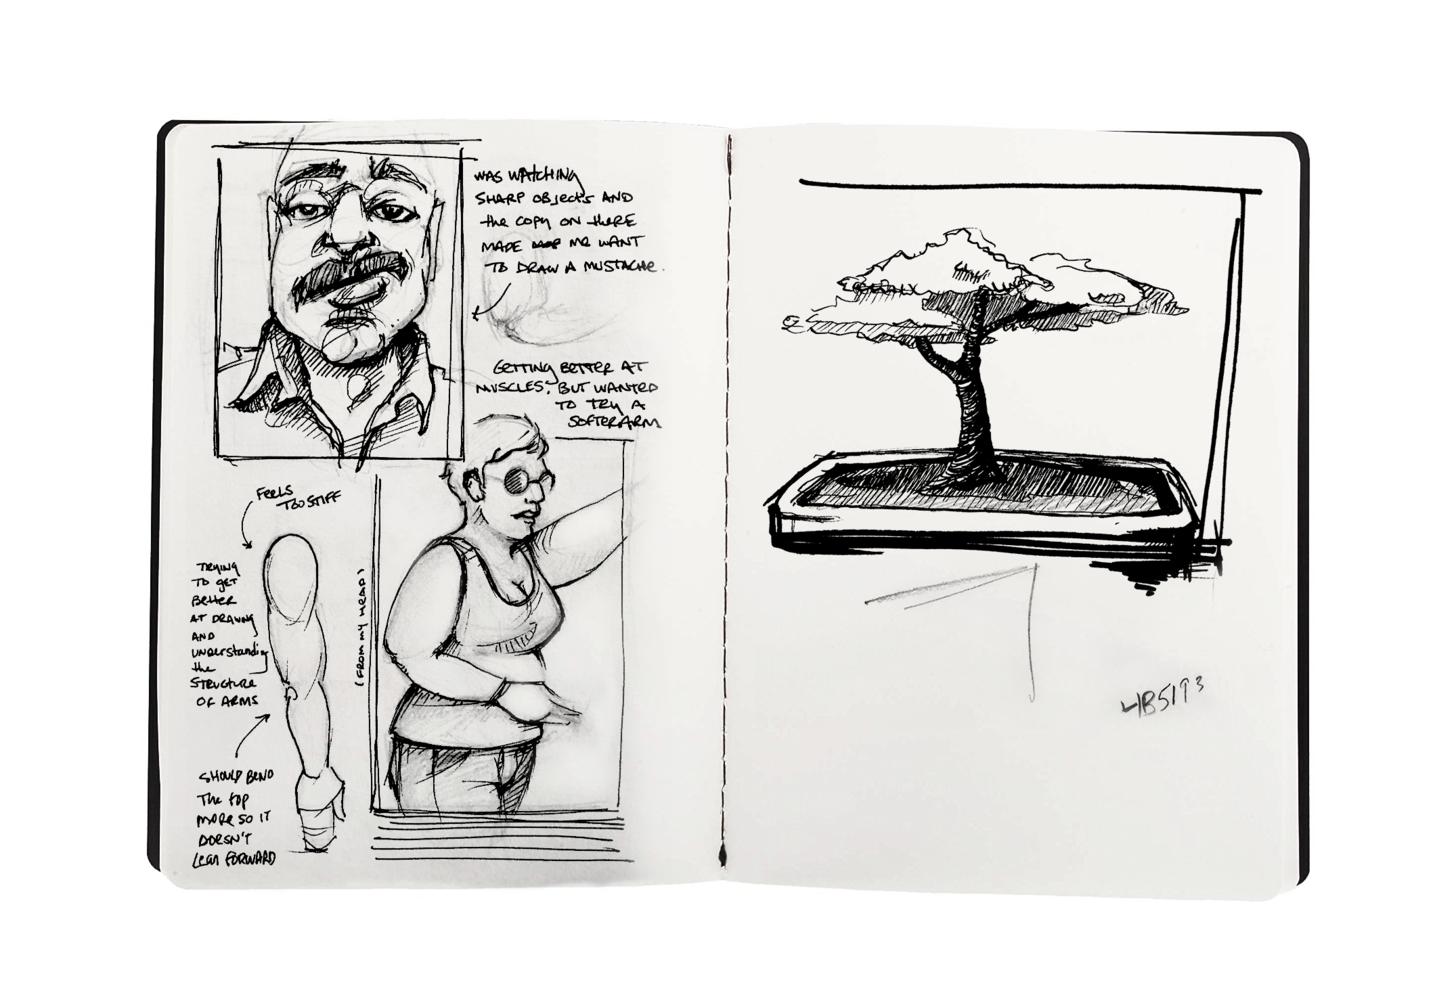 Sketchbook8.png